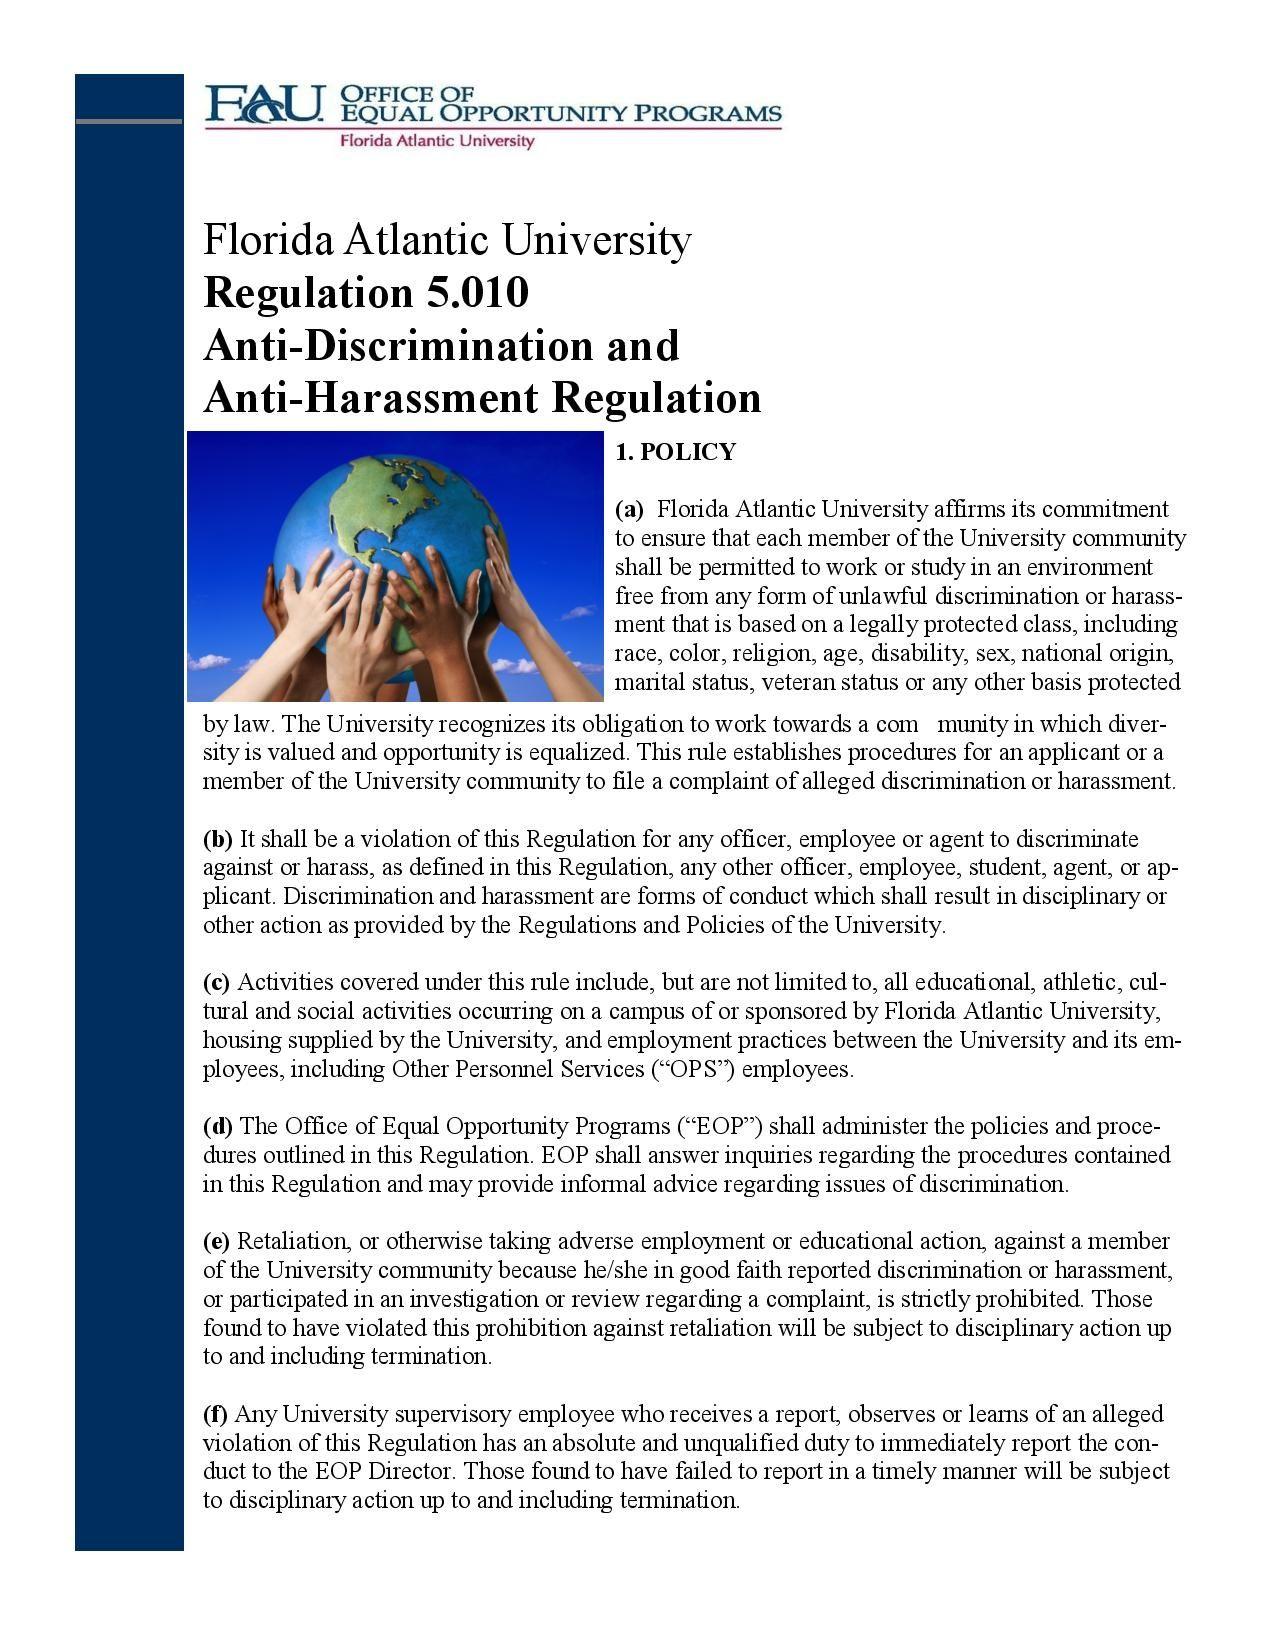 Pin On Articles Florida Atlantic University Fau